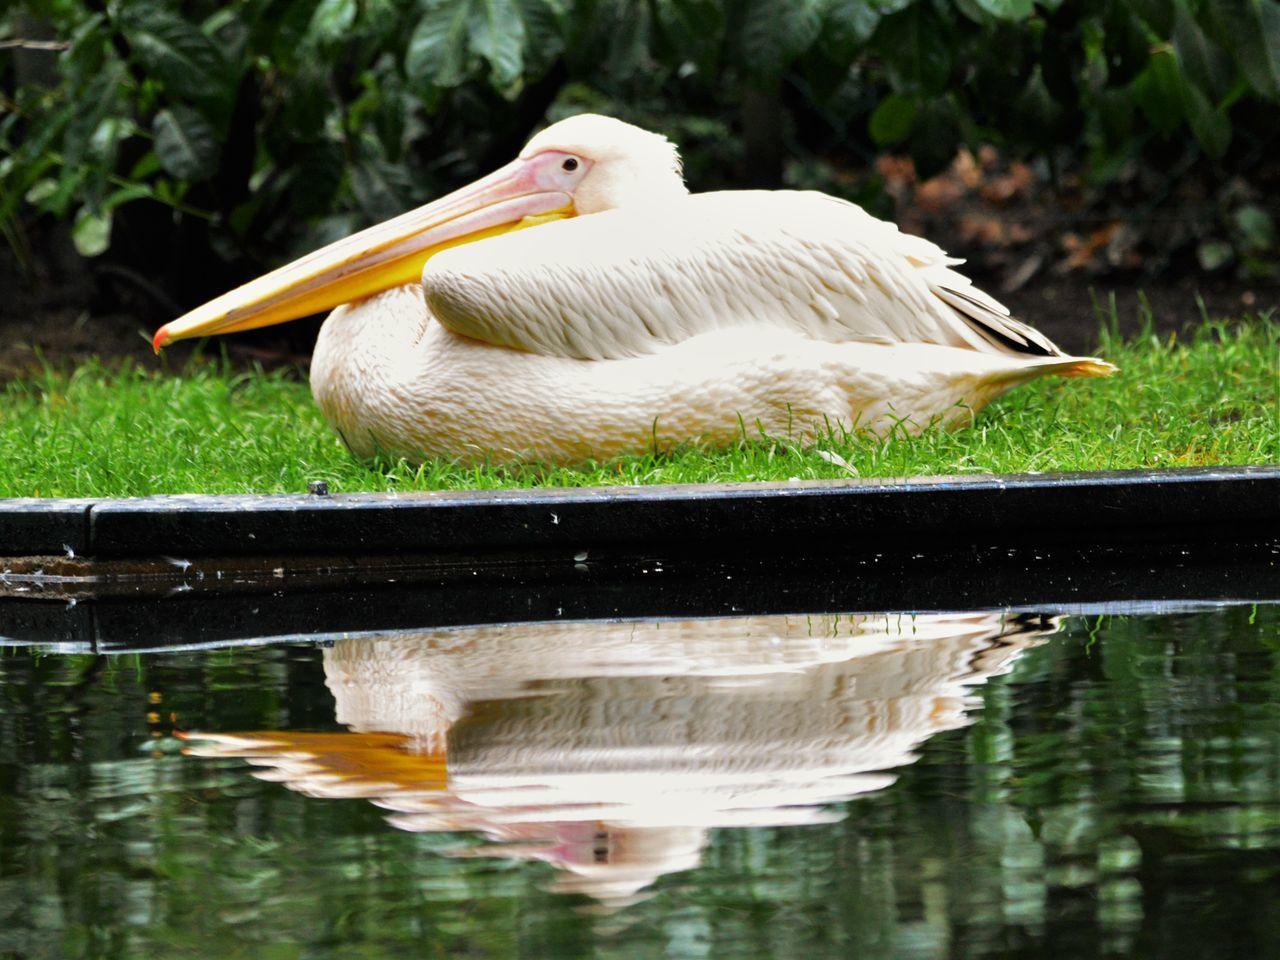 Arnhem Bird Burgerszoo Netherlands Niederlande Pelecanus Pelican Pelicano Pelikane Pinkpelican Vogel Wildlife Zoo ペリカン属 First Eyeem Photo